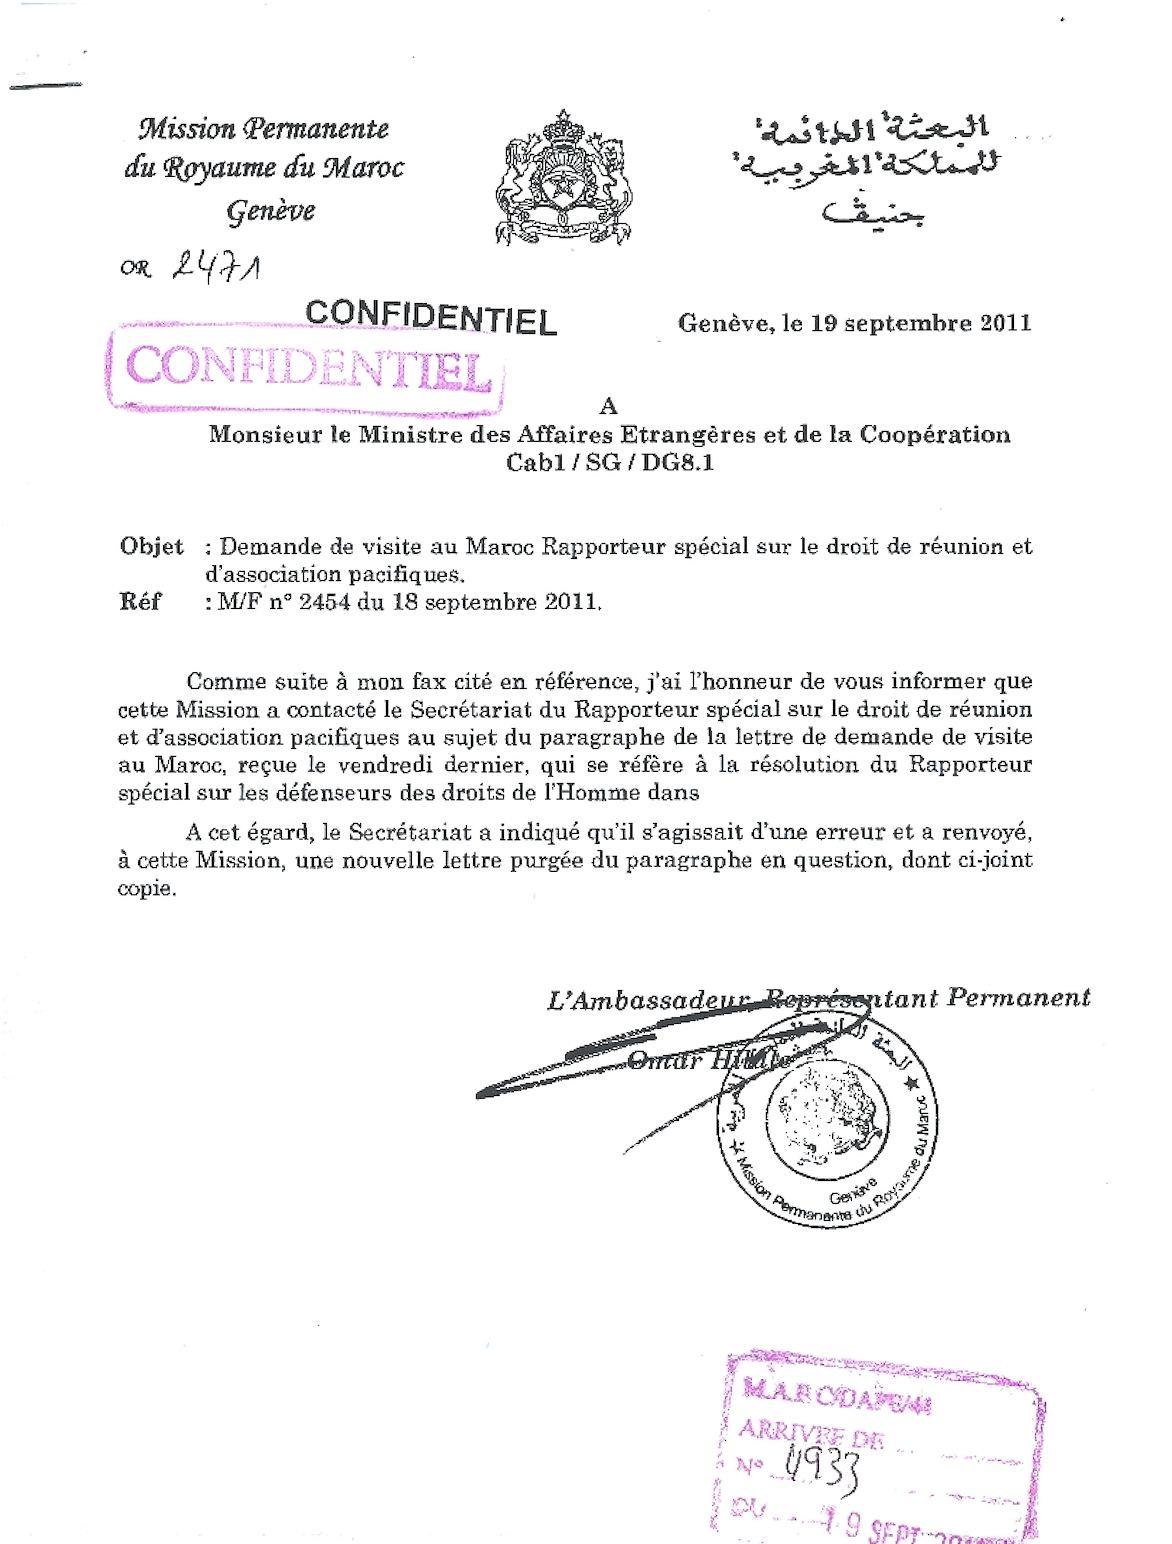 2471 Genève